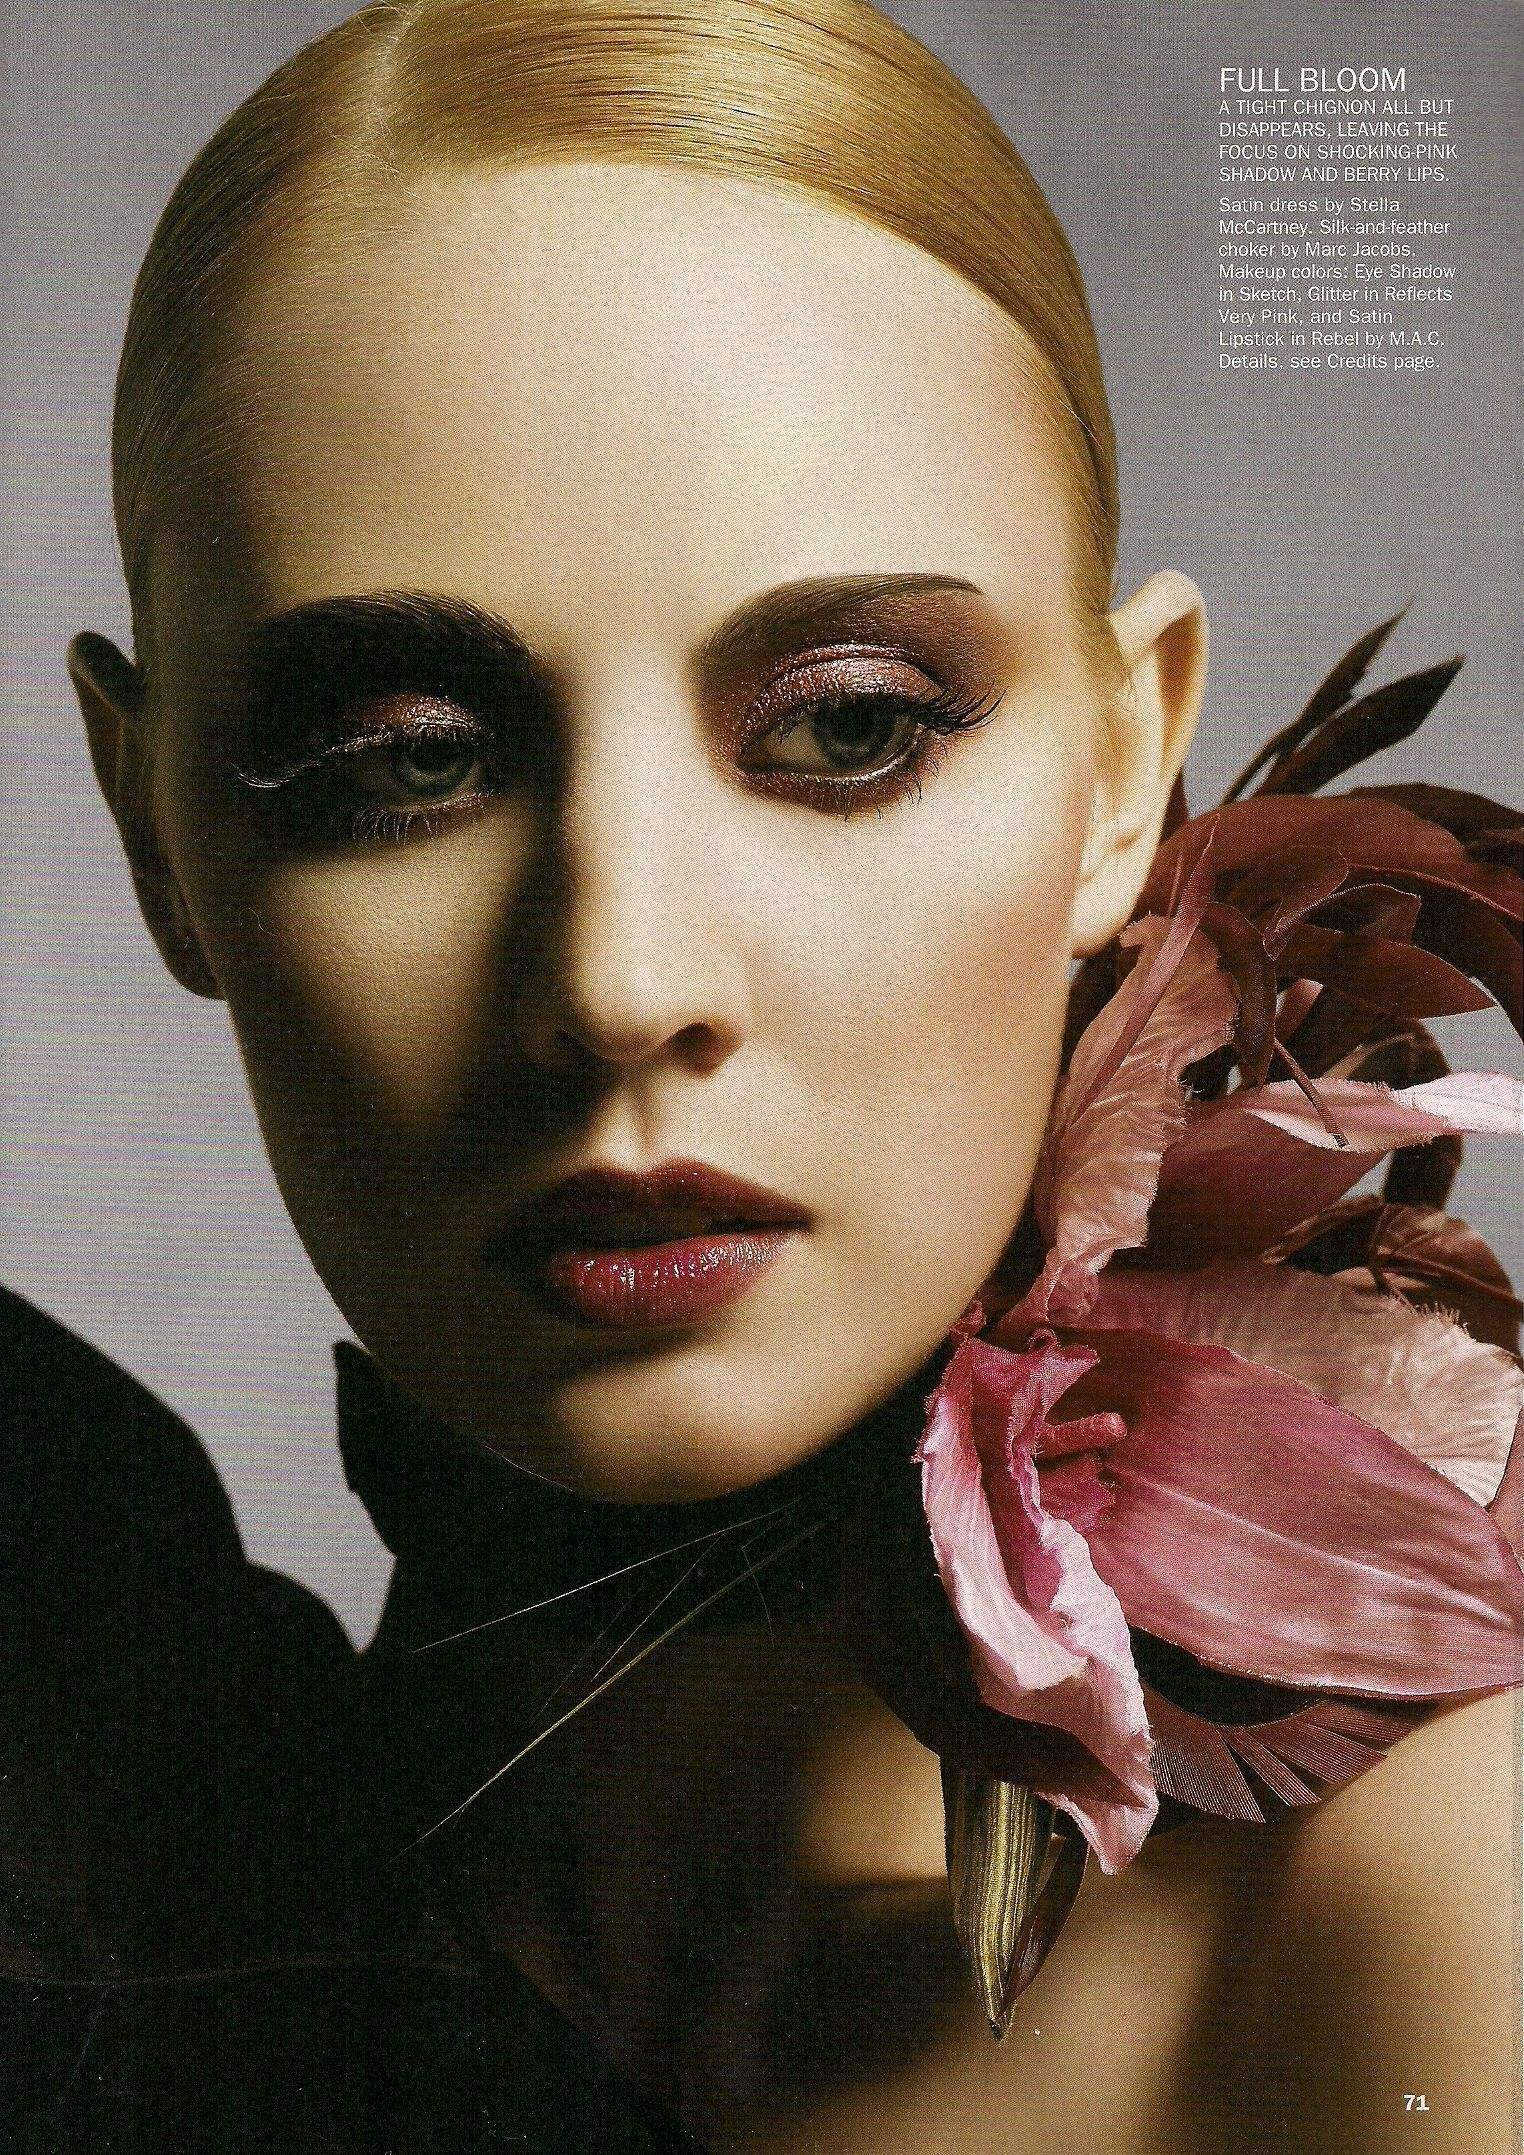 Deborah Ann Woll - Allure photoshoot